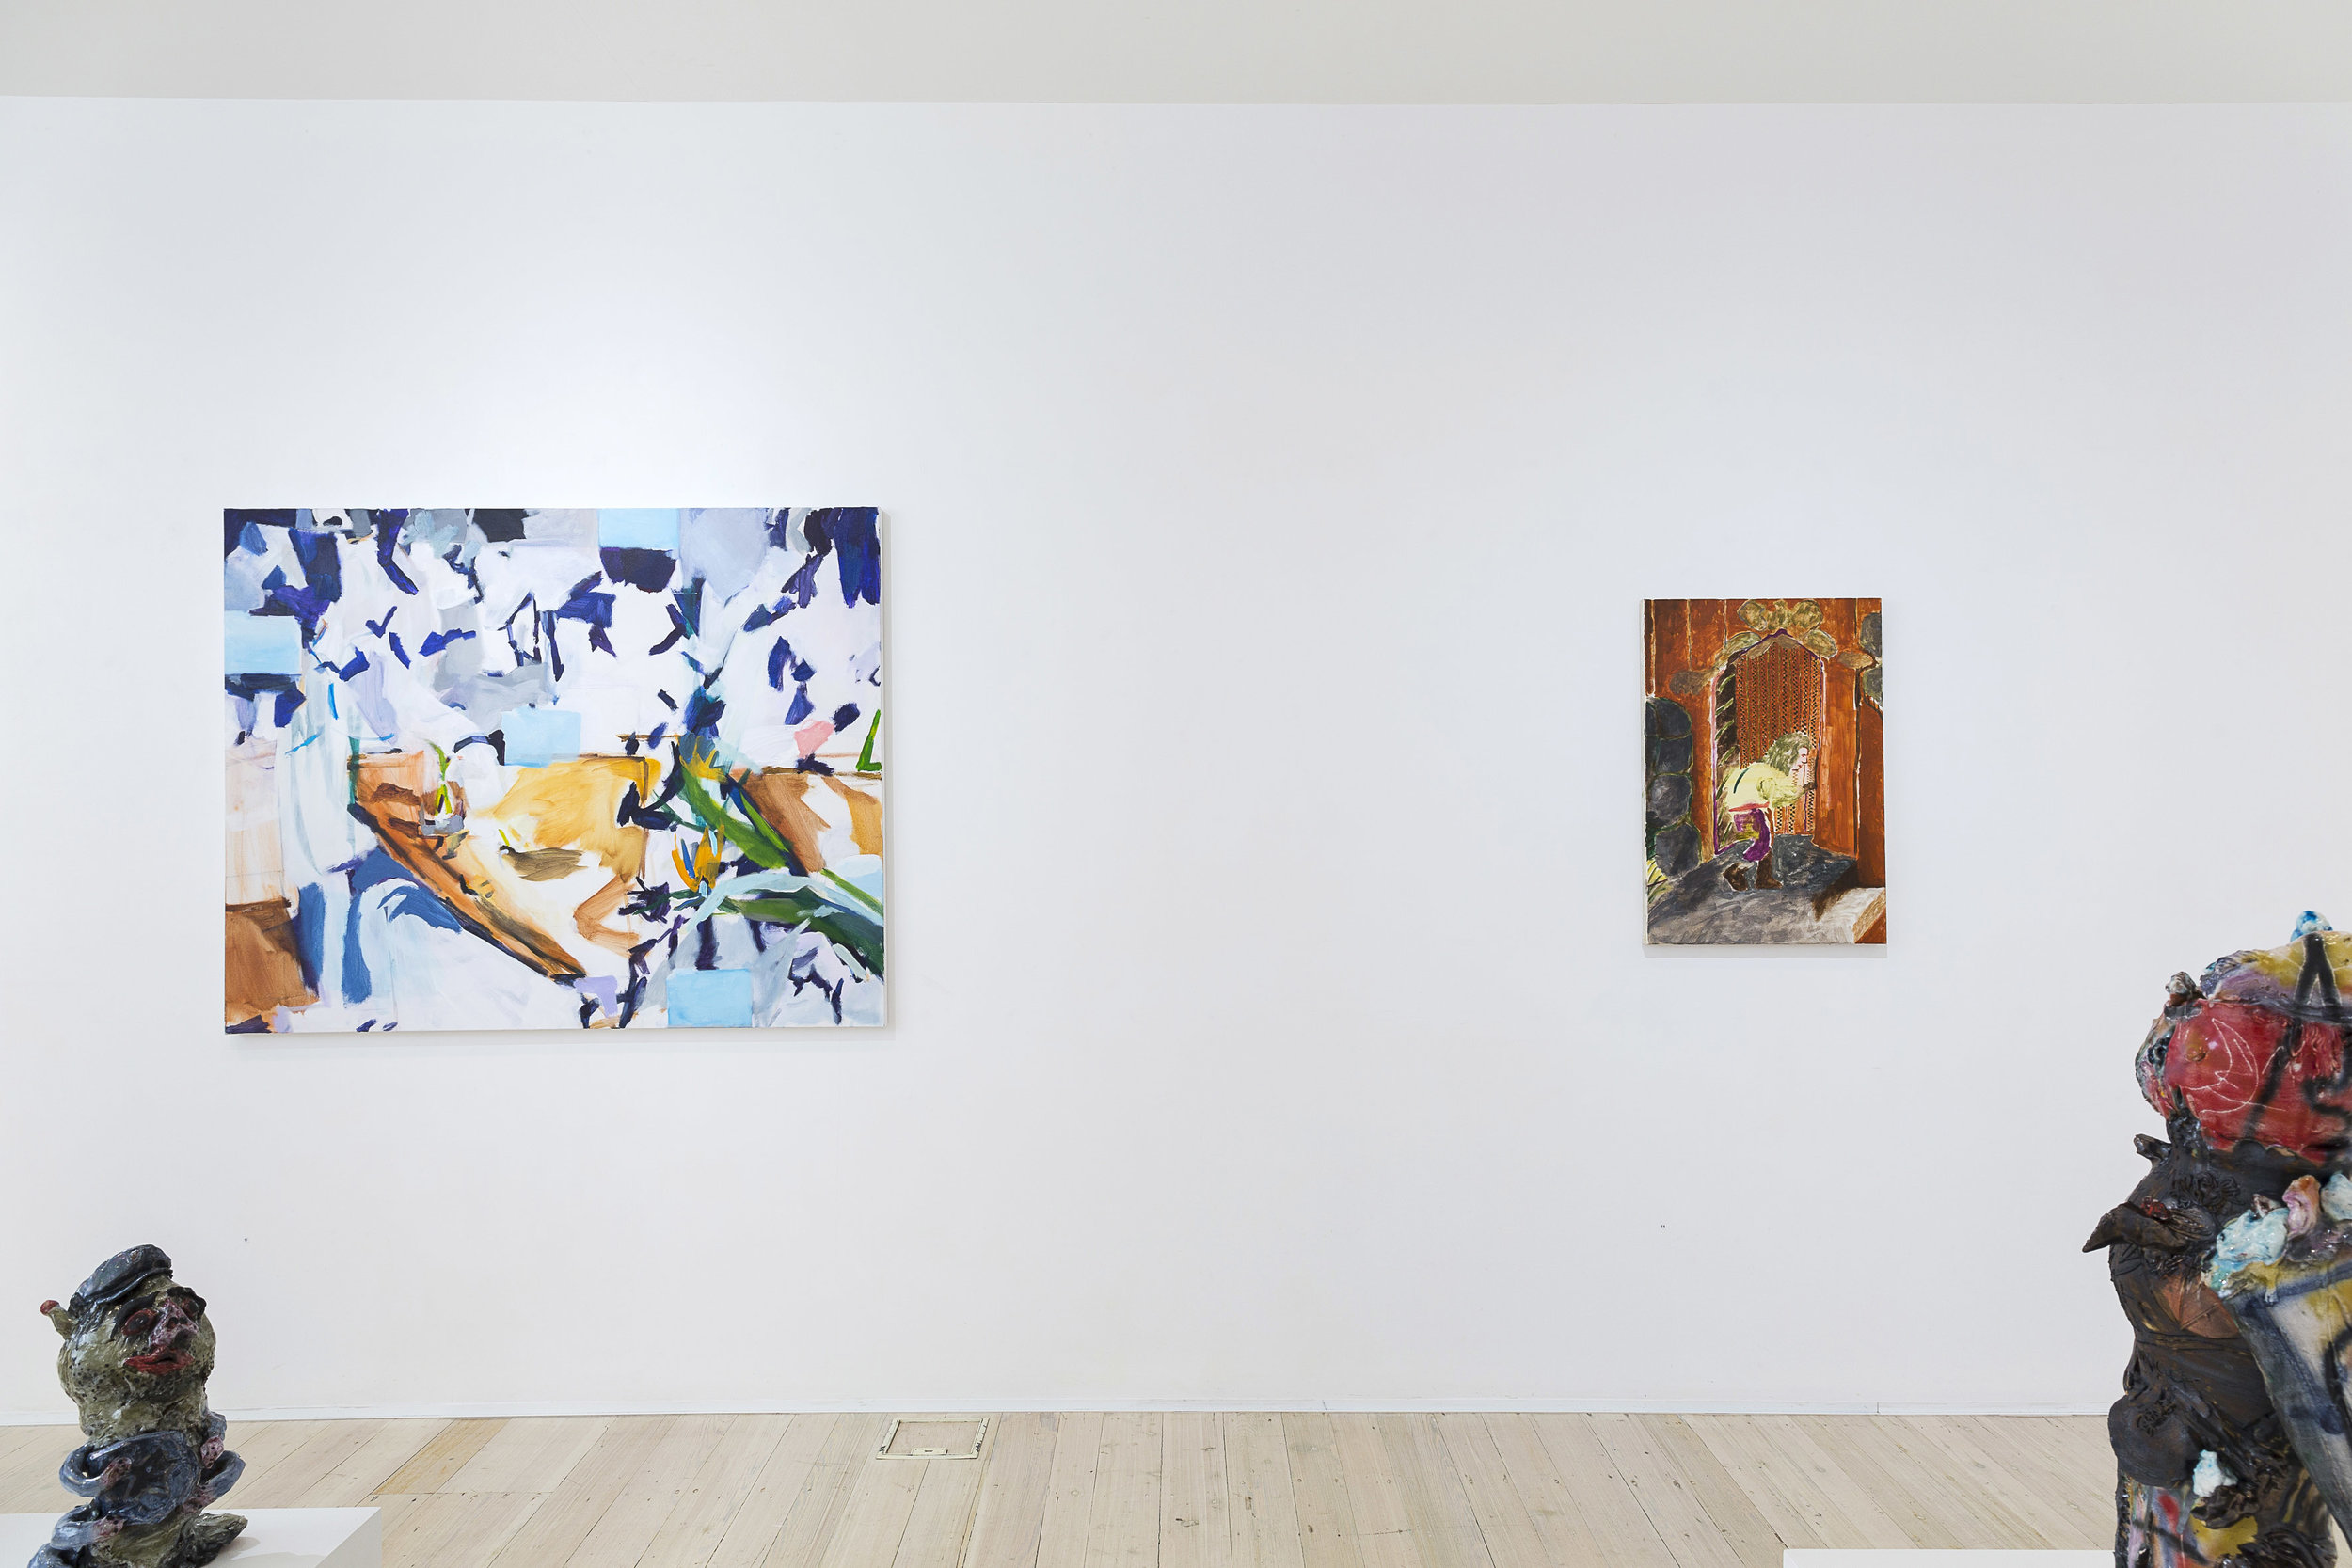 Gallery 9,Catherine Clayton-Smith, Ryan Hancock, Tim Price